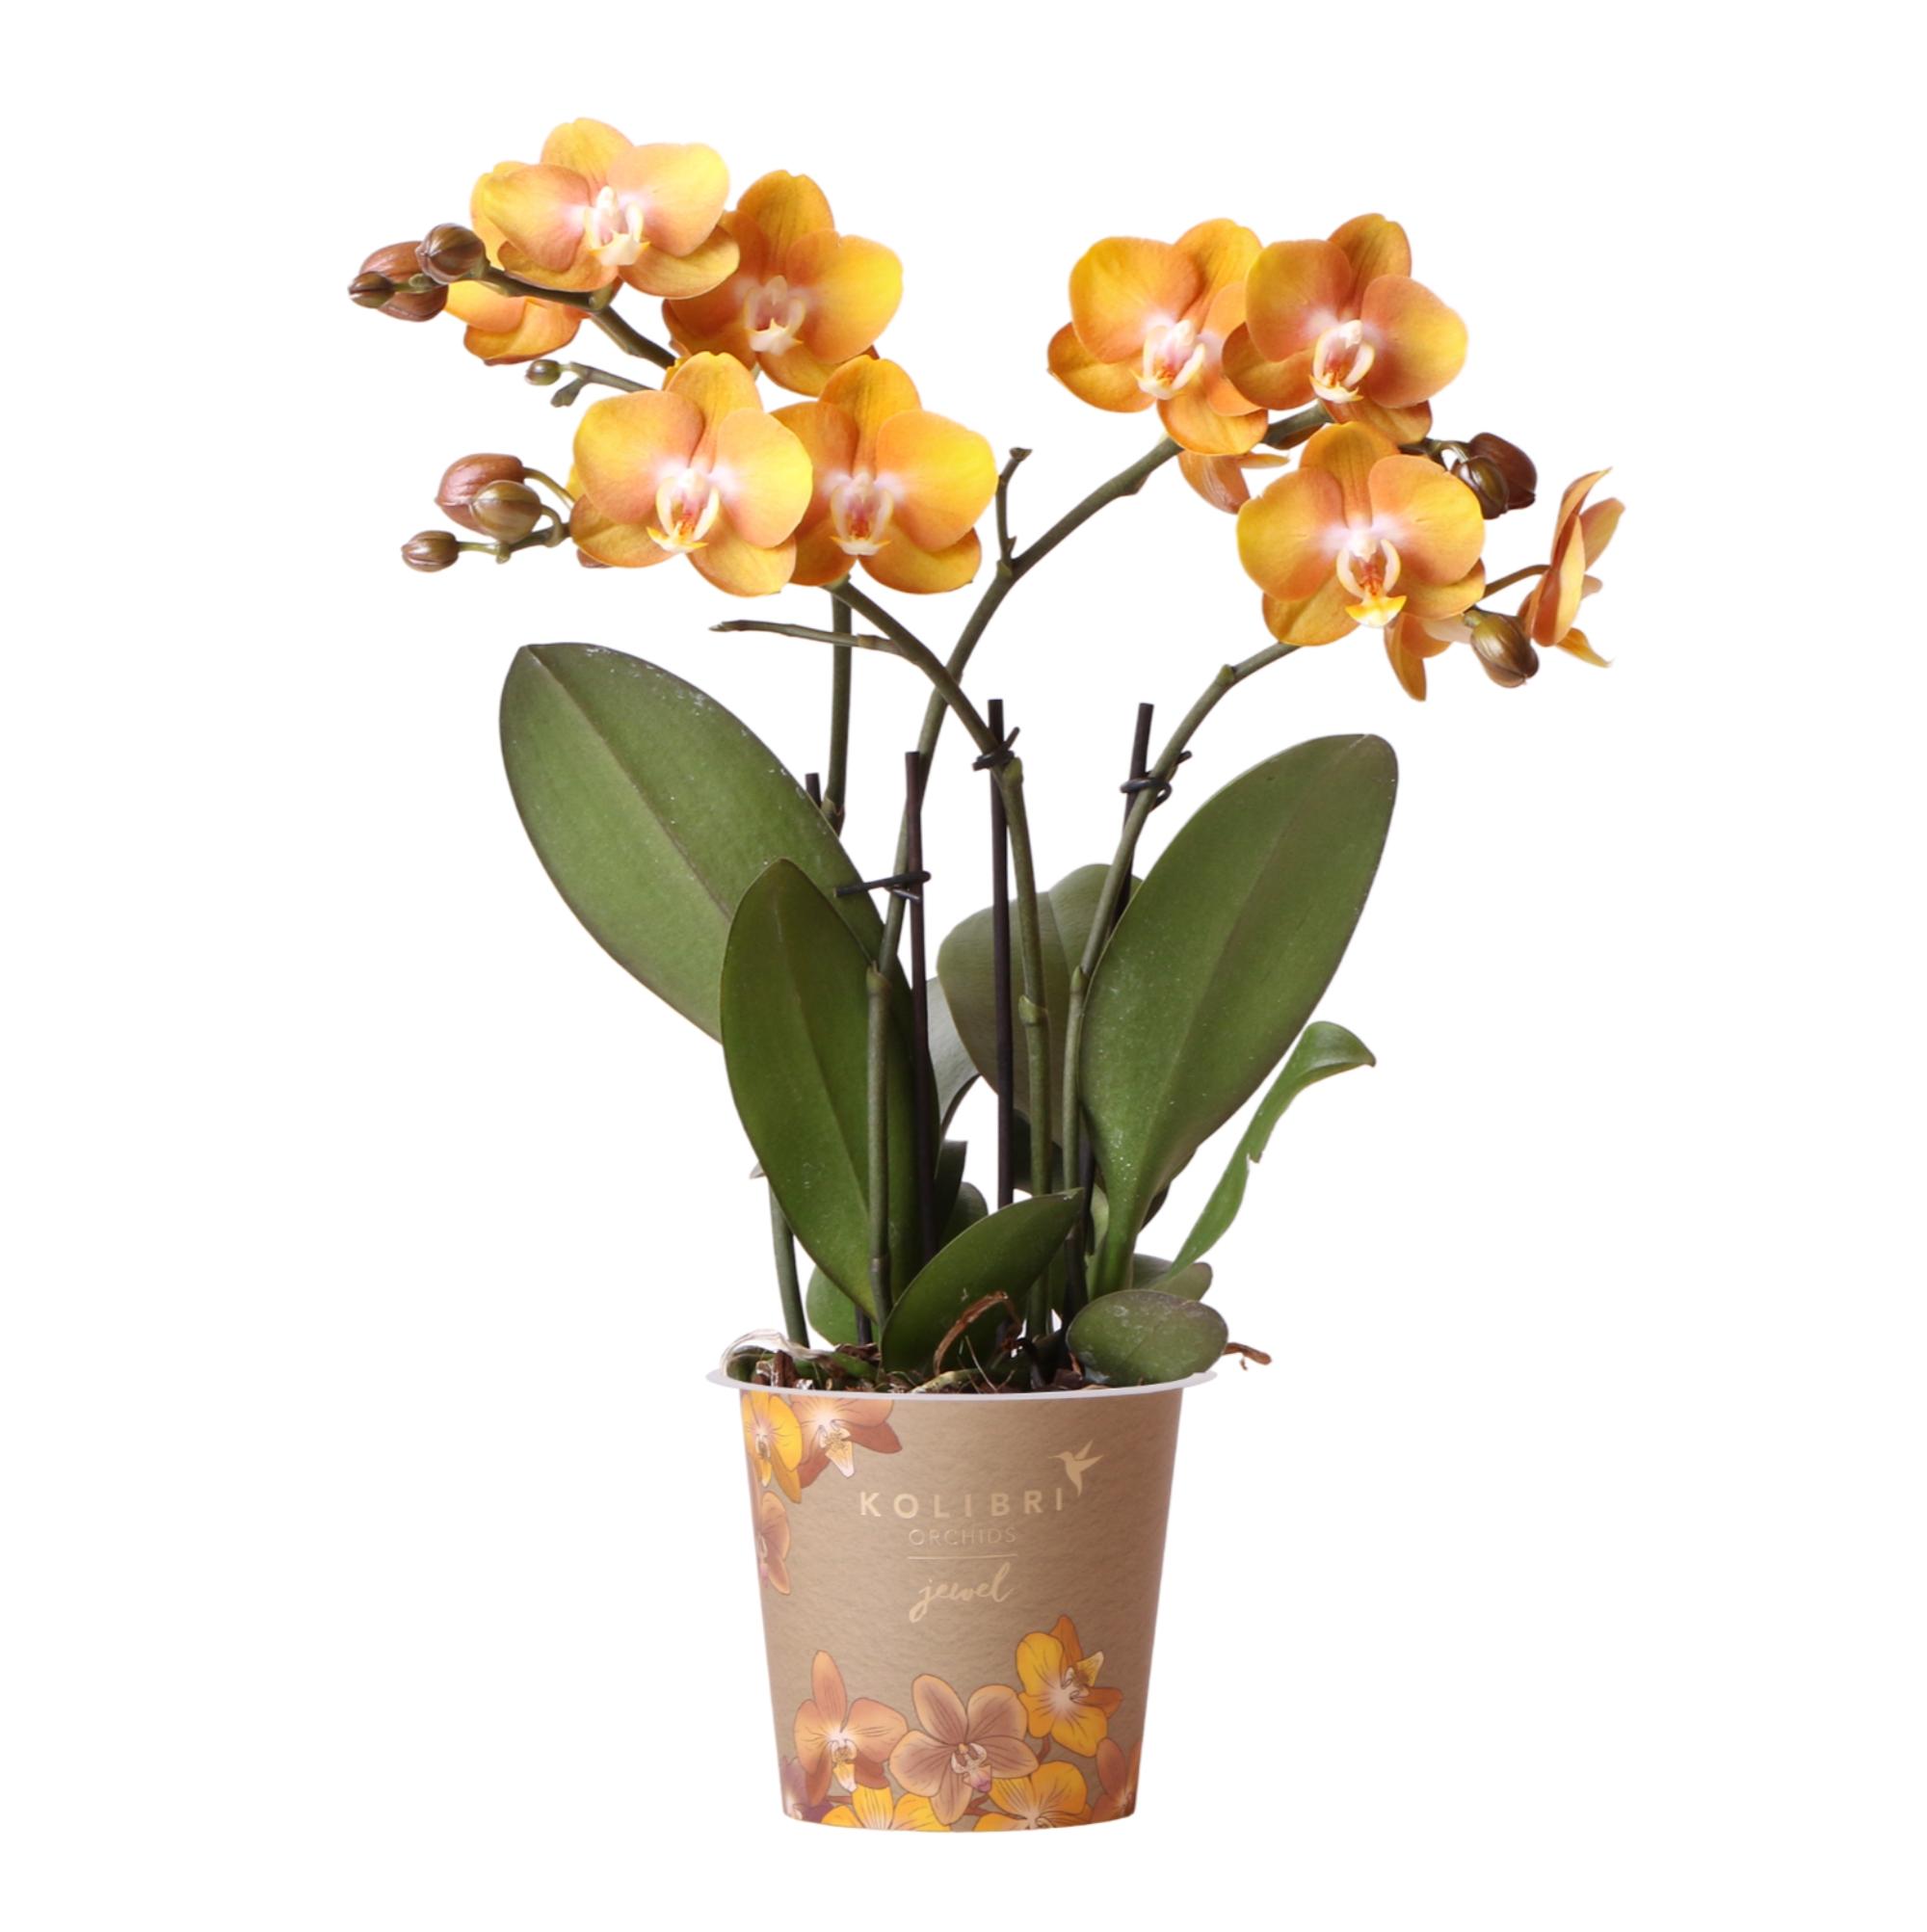 Kolibri Orchids - Jewel orchidee Las Vegas 12cm